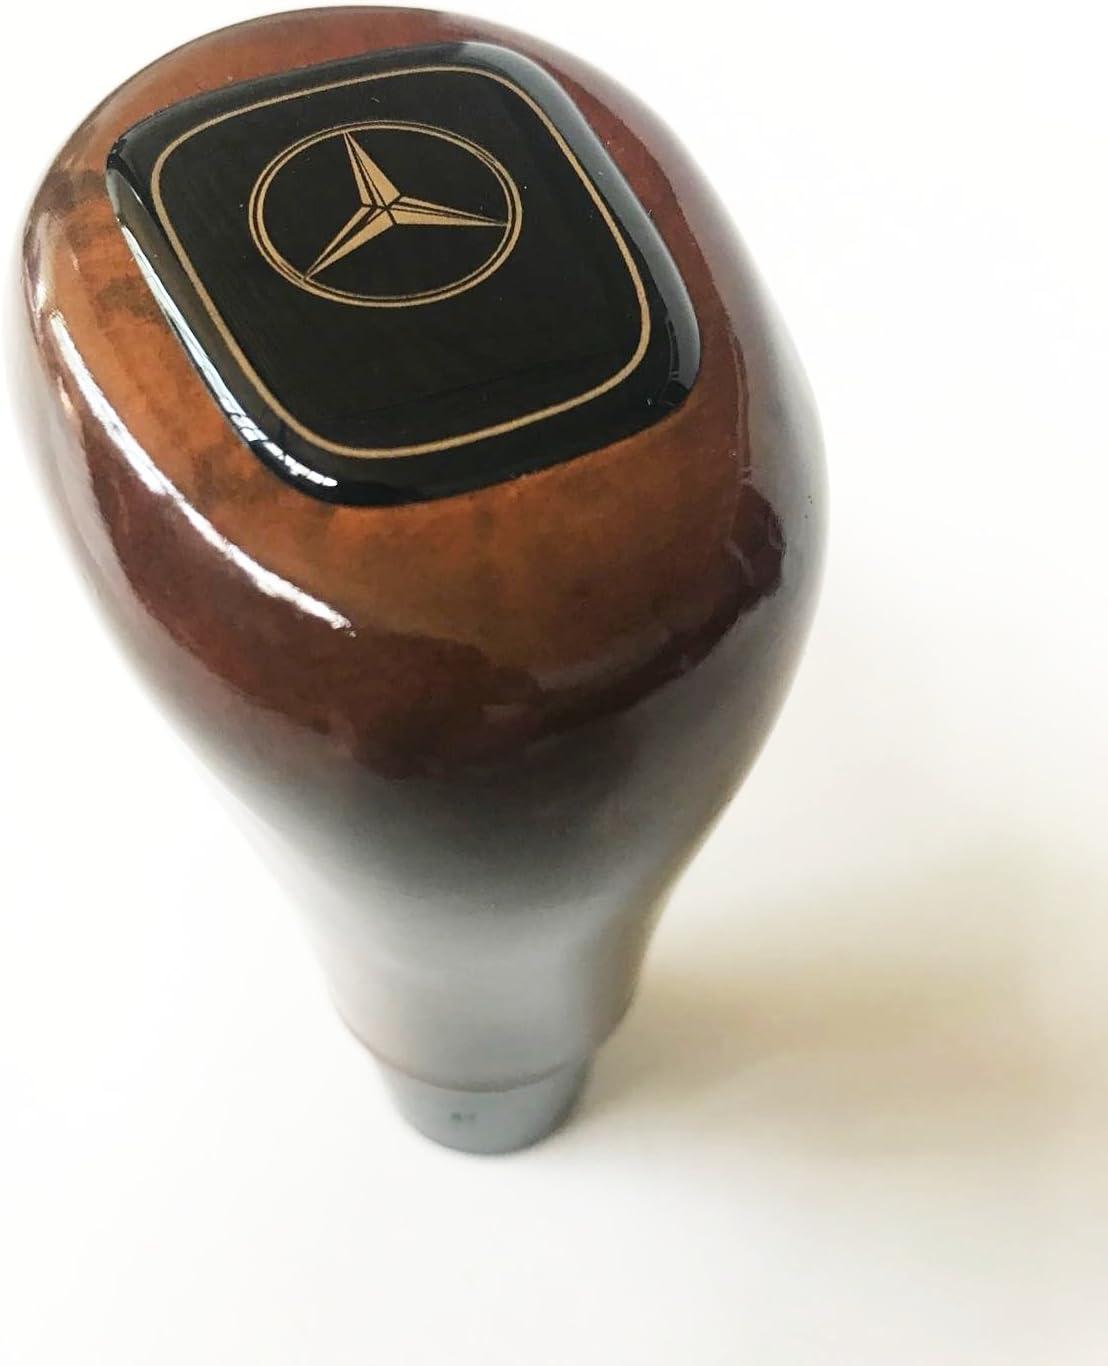 Ladika Wood Gear Shift Knob for Mercedes Wallnut Manuel W114 W115 W116 W123 W124 W126 W201